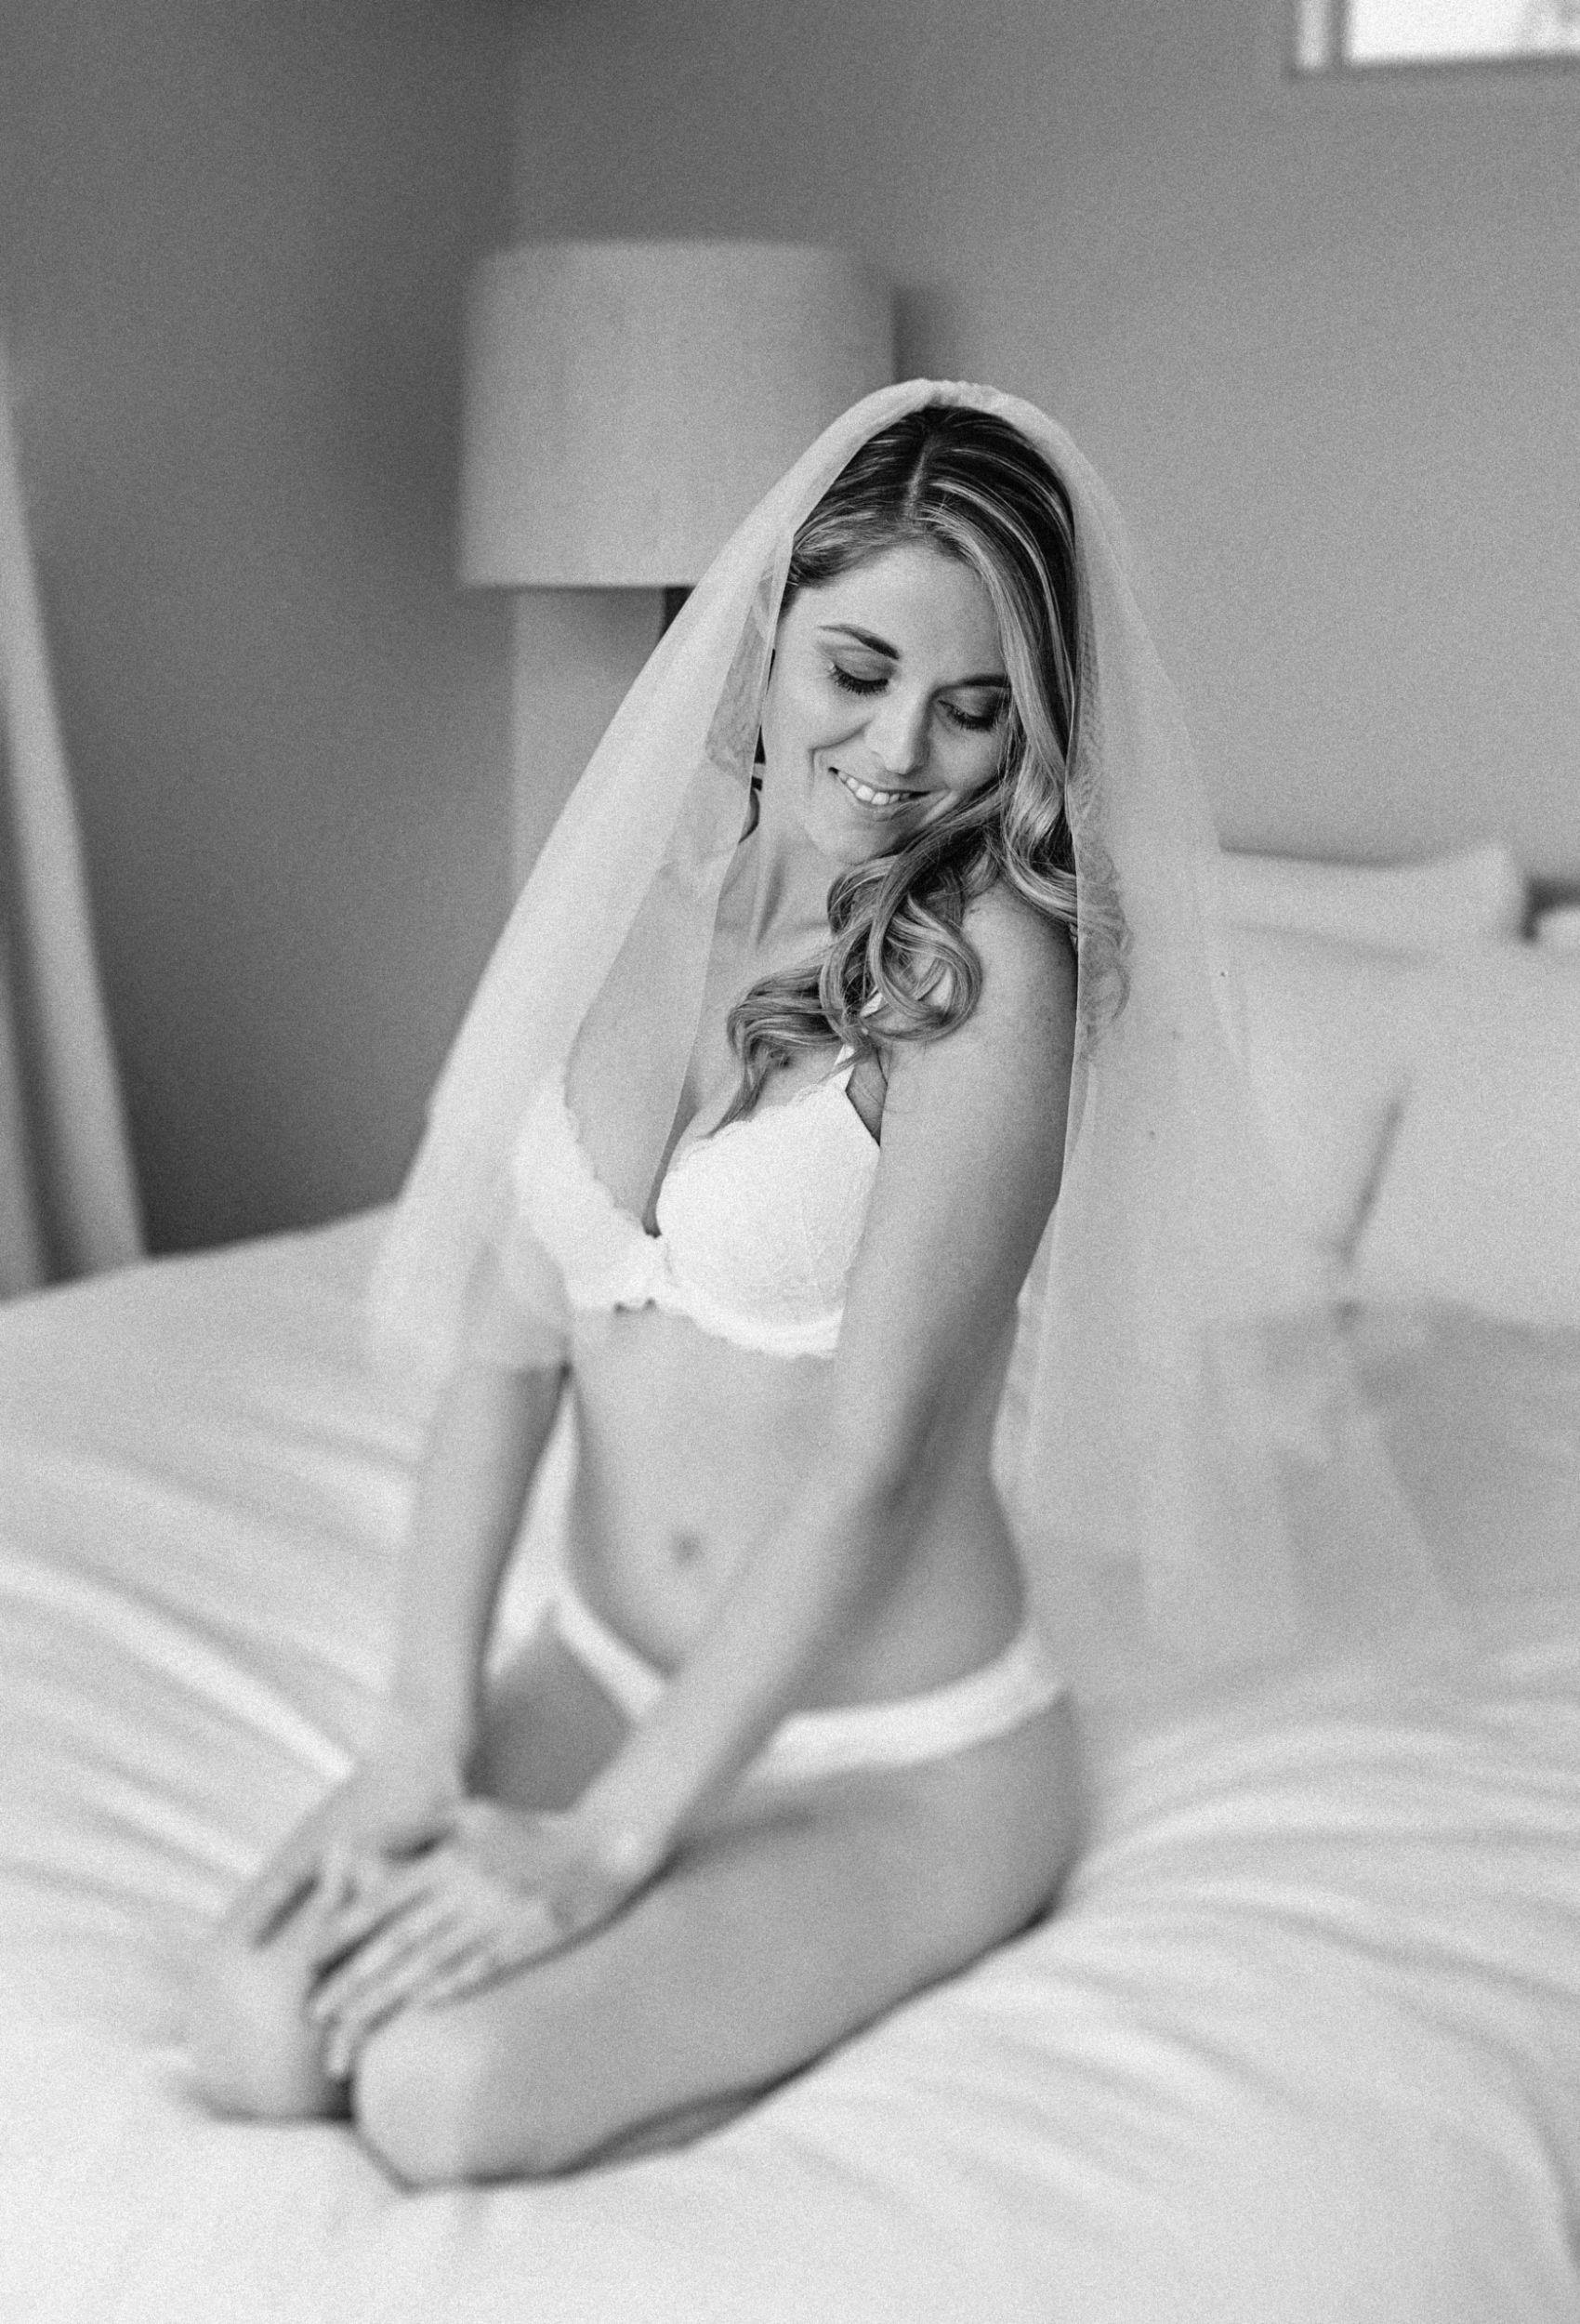 boudoir photography, intimate photos Auckland